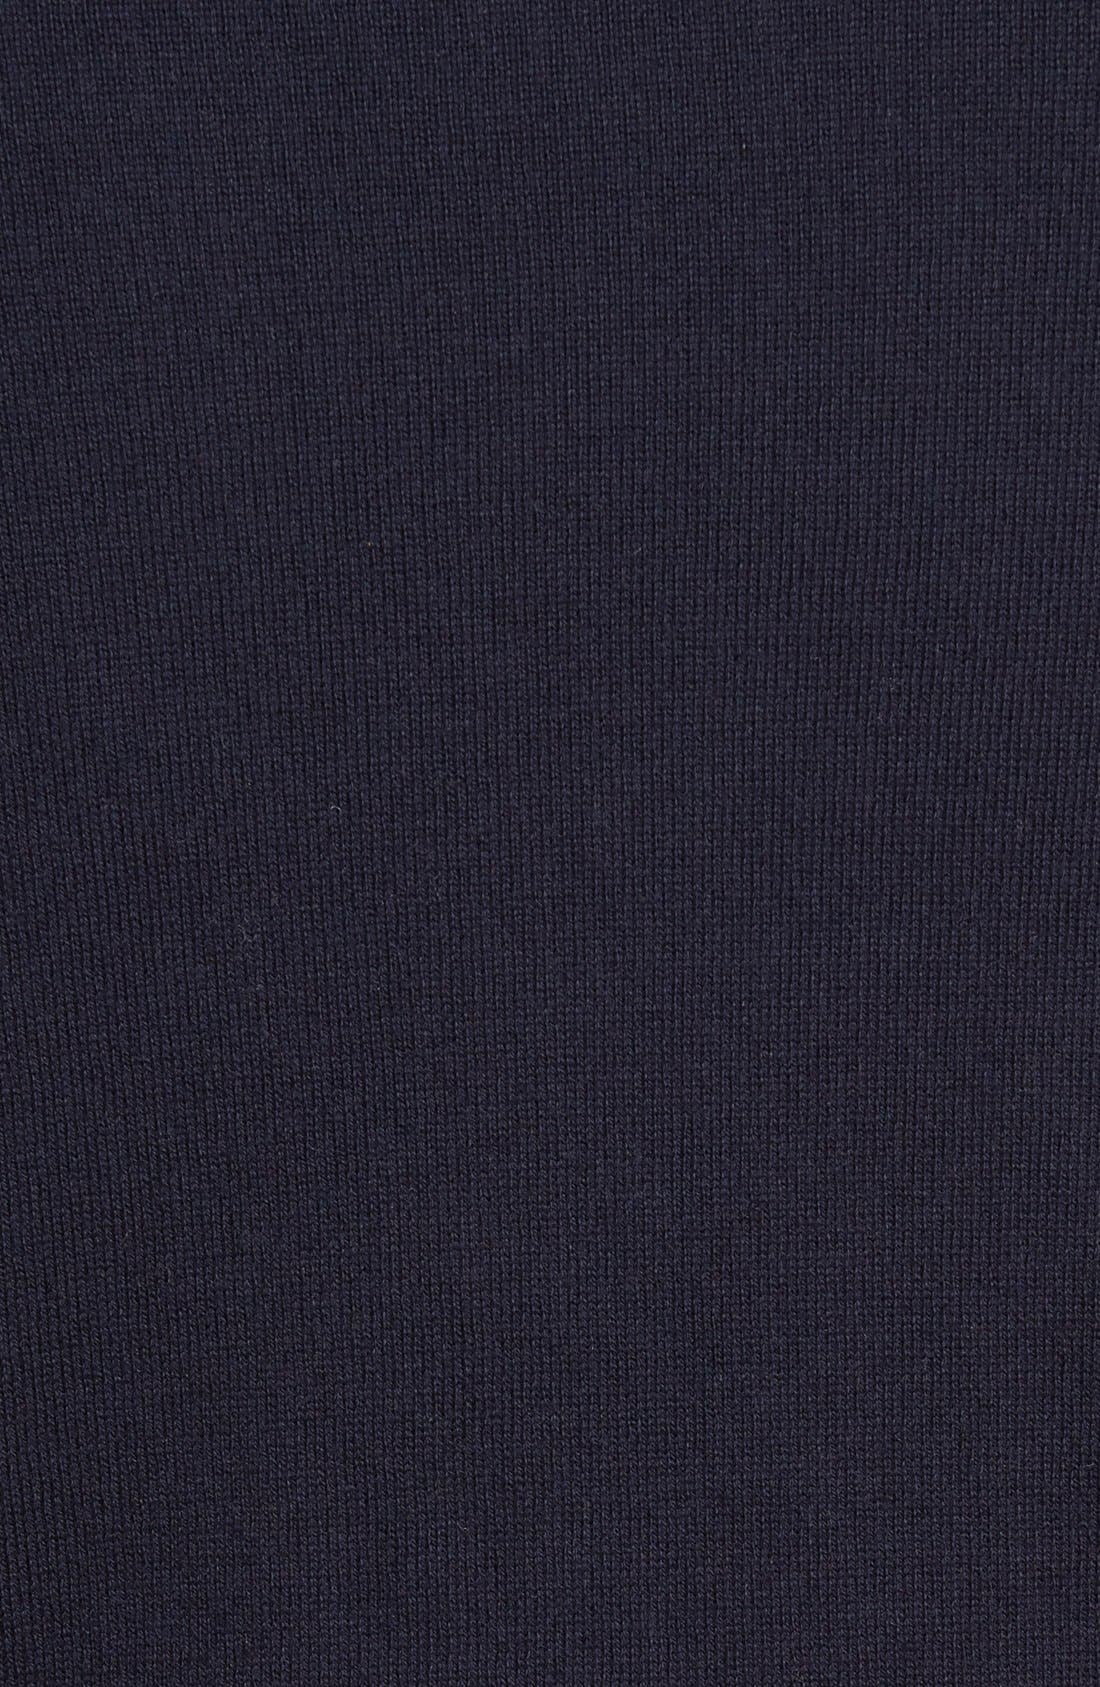 Alternate Image 2  - Nordstrom Men's Shop Half Zip Cotton & Cashmere Pullover (Regular & Tall)